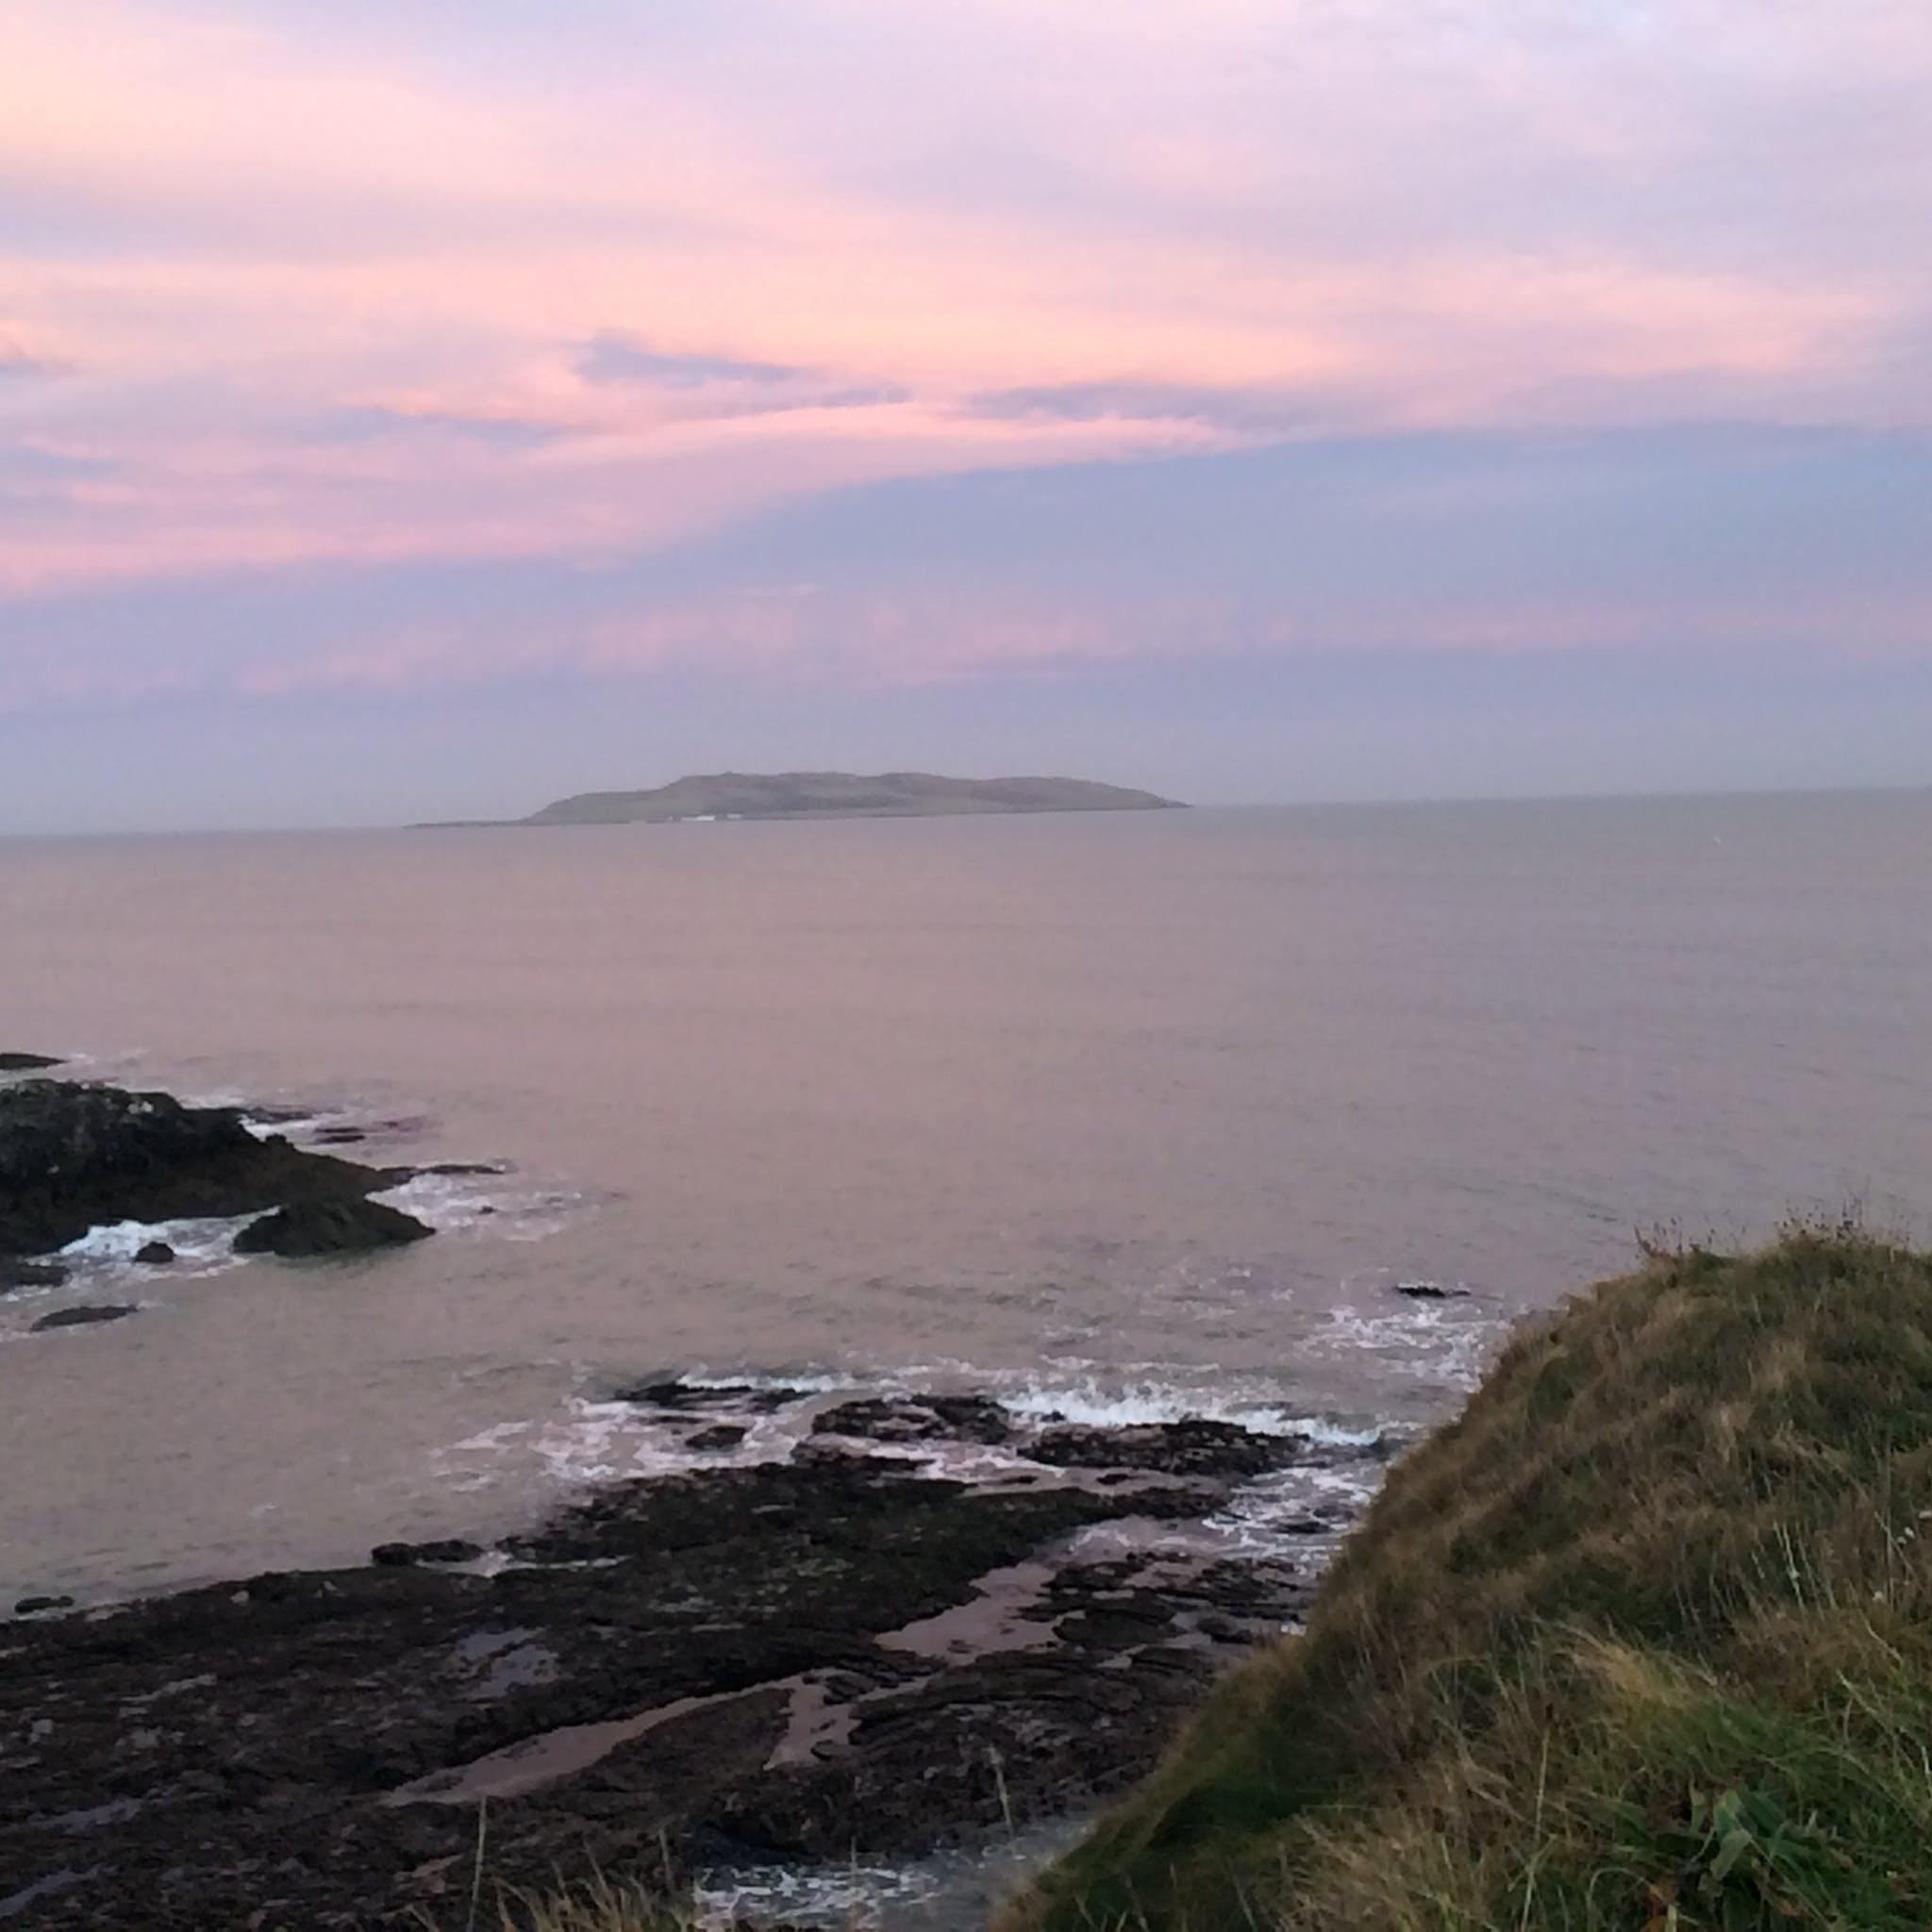 Free stock photo of sunset, beach, island, dublin